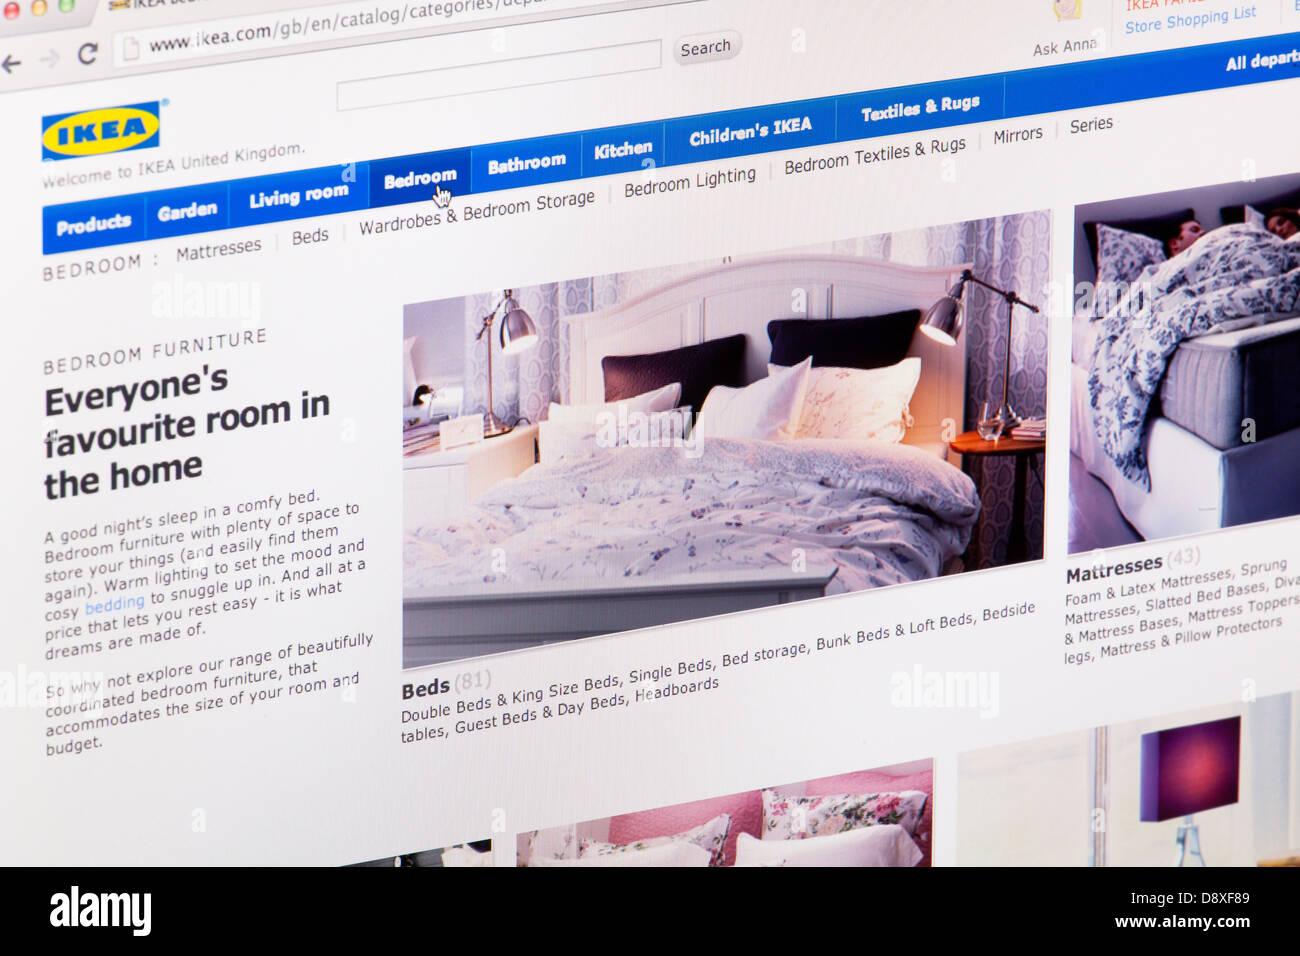 Ikea Website Screen Stock Photos & Ikea Website Screen Stock